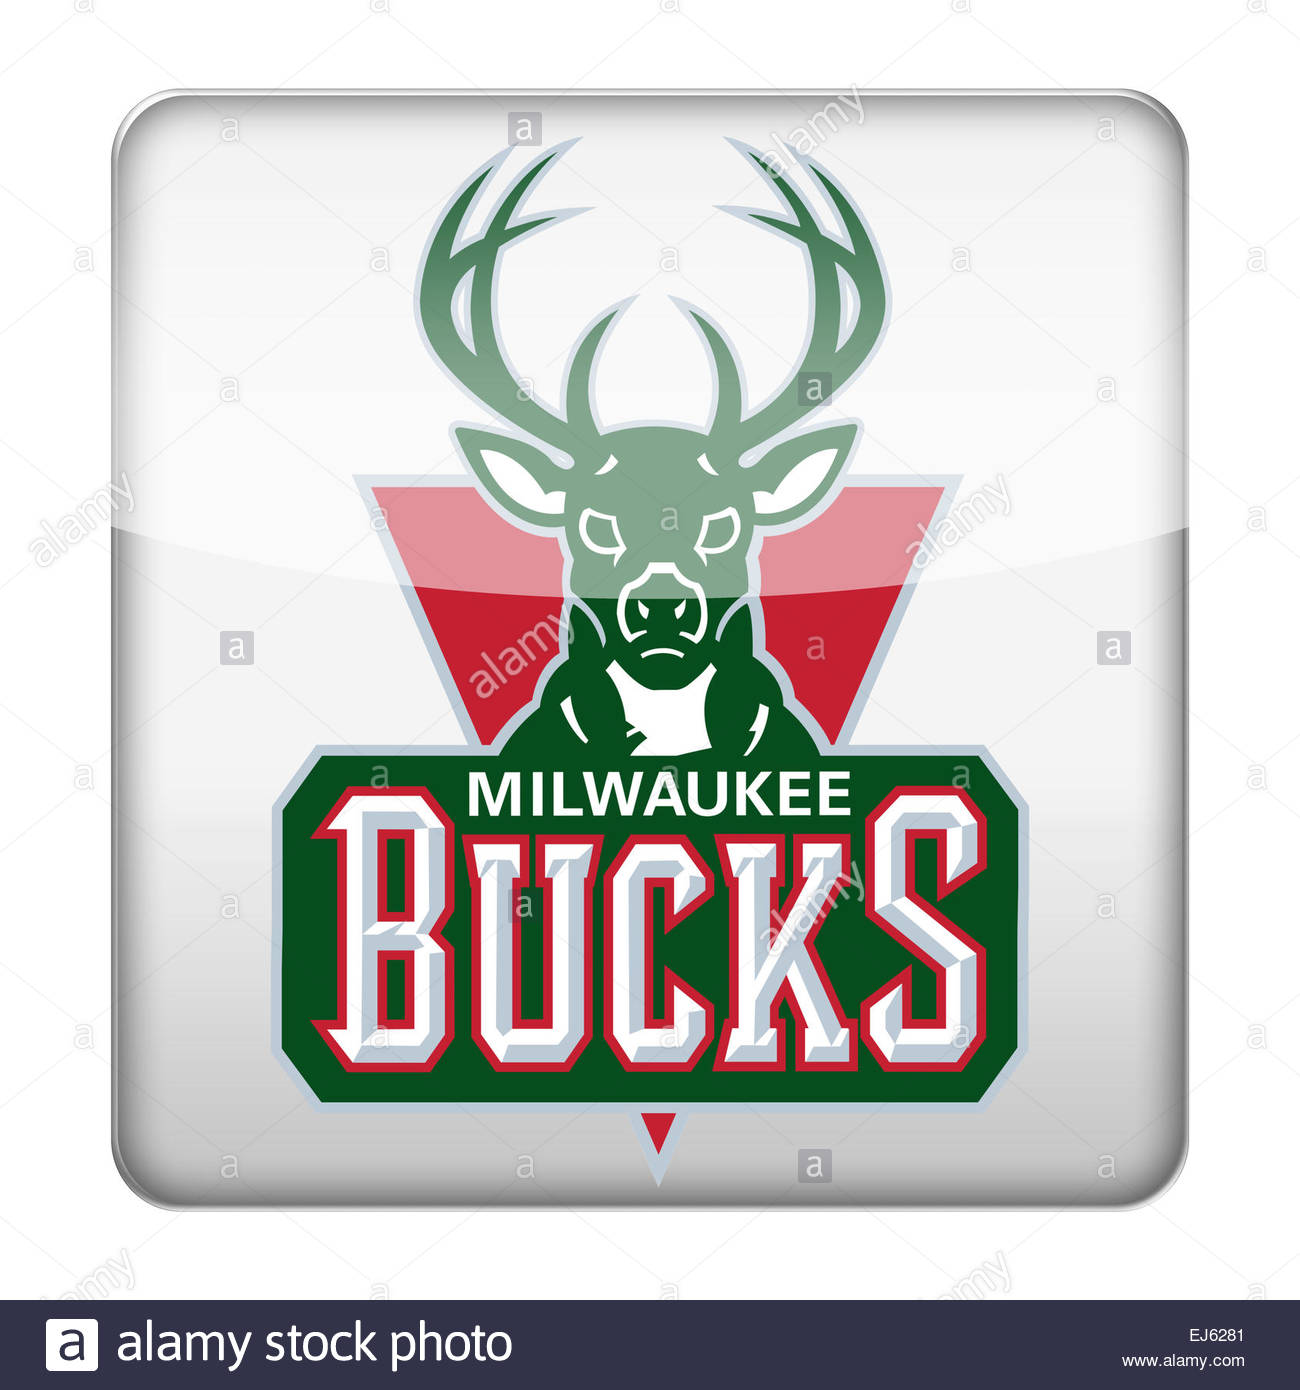 Milwaukee Bucks logo icon - Stock Image